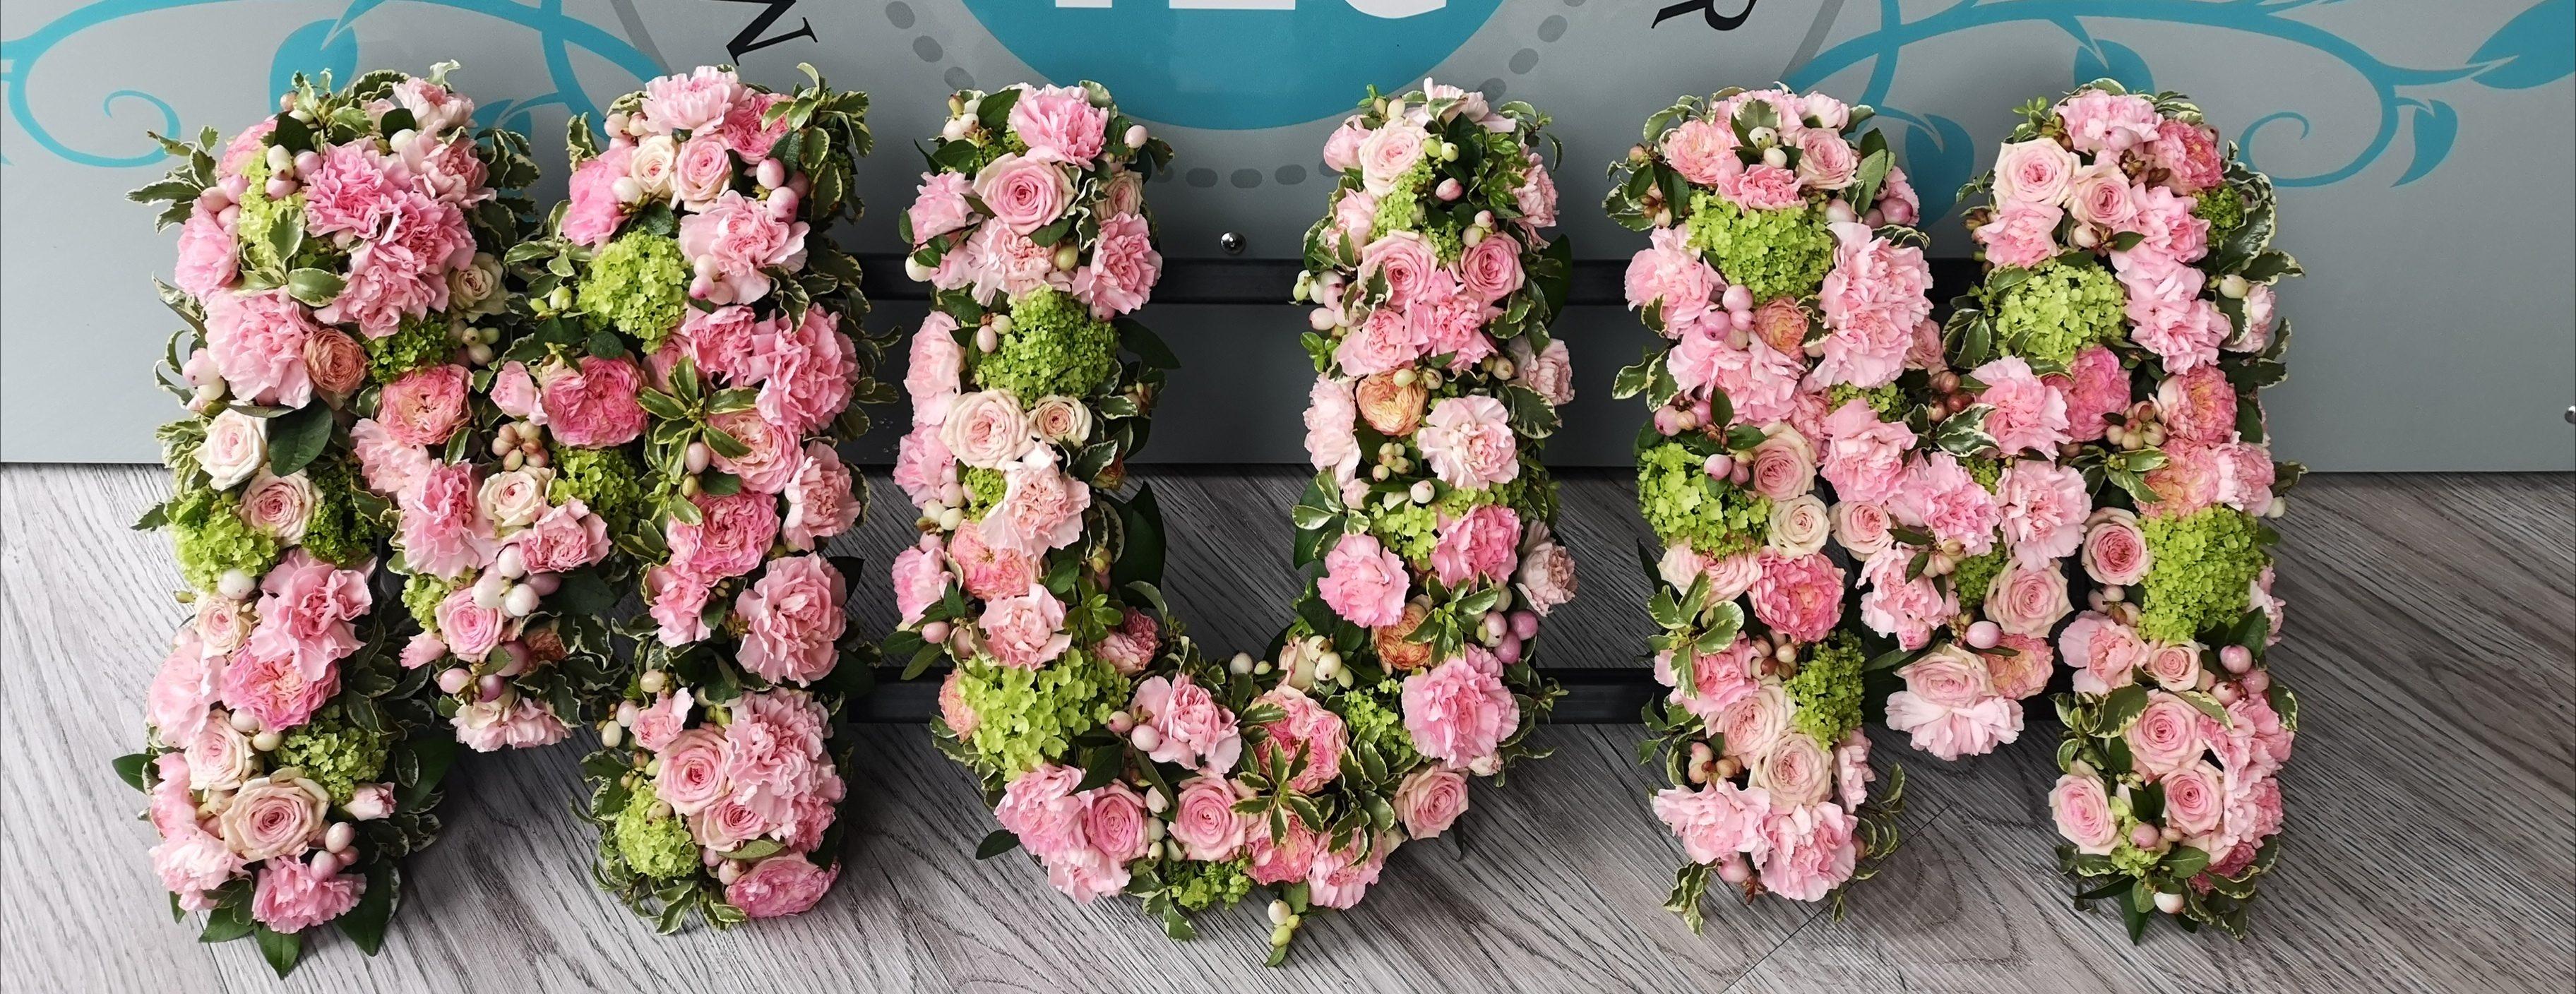 Funeral Flowers Mum Tribute £135